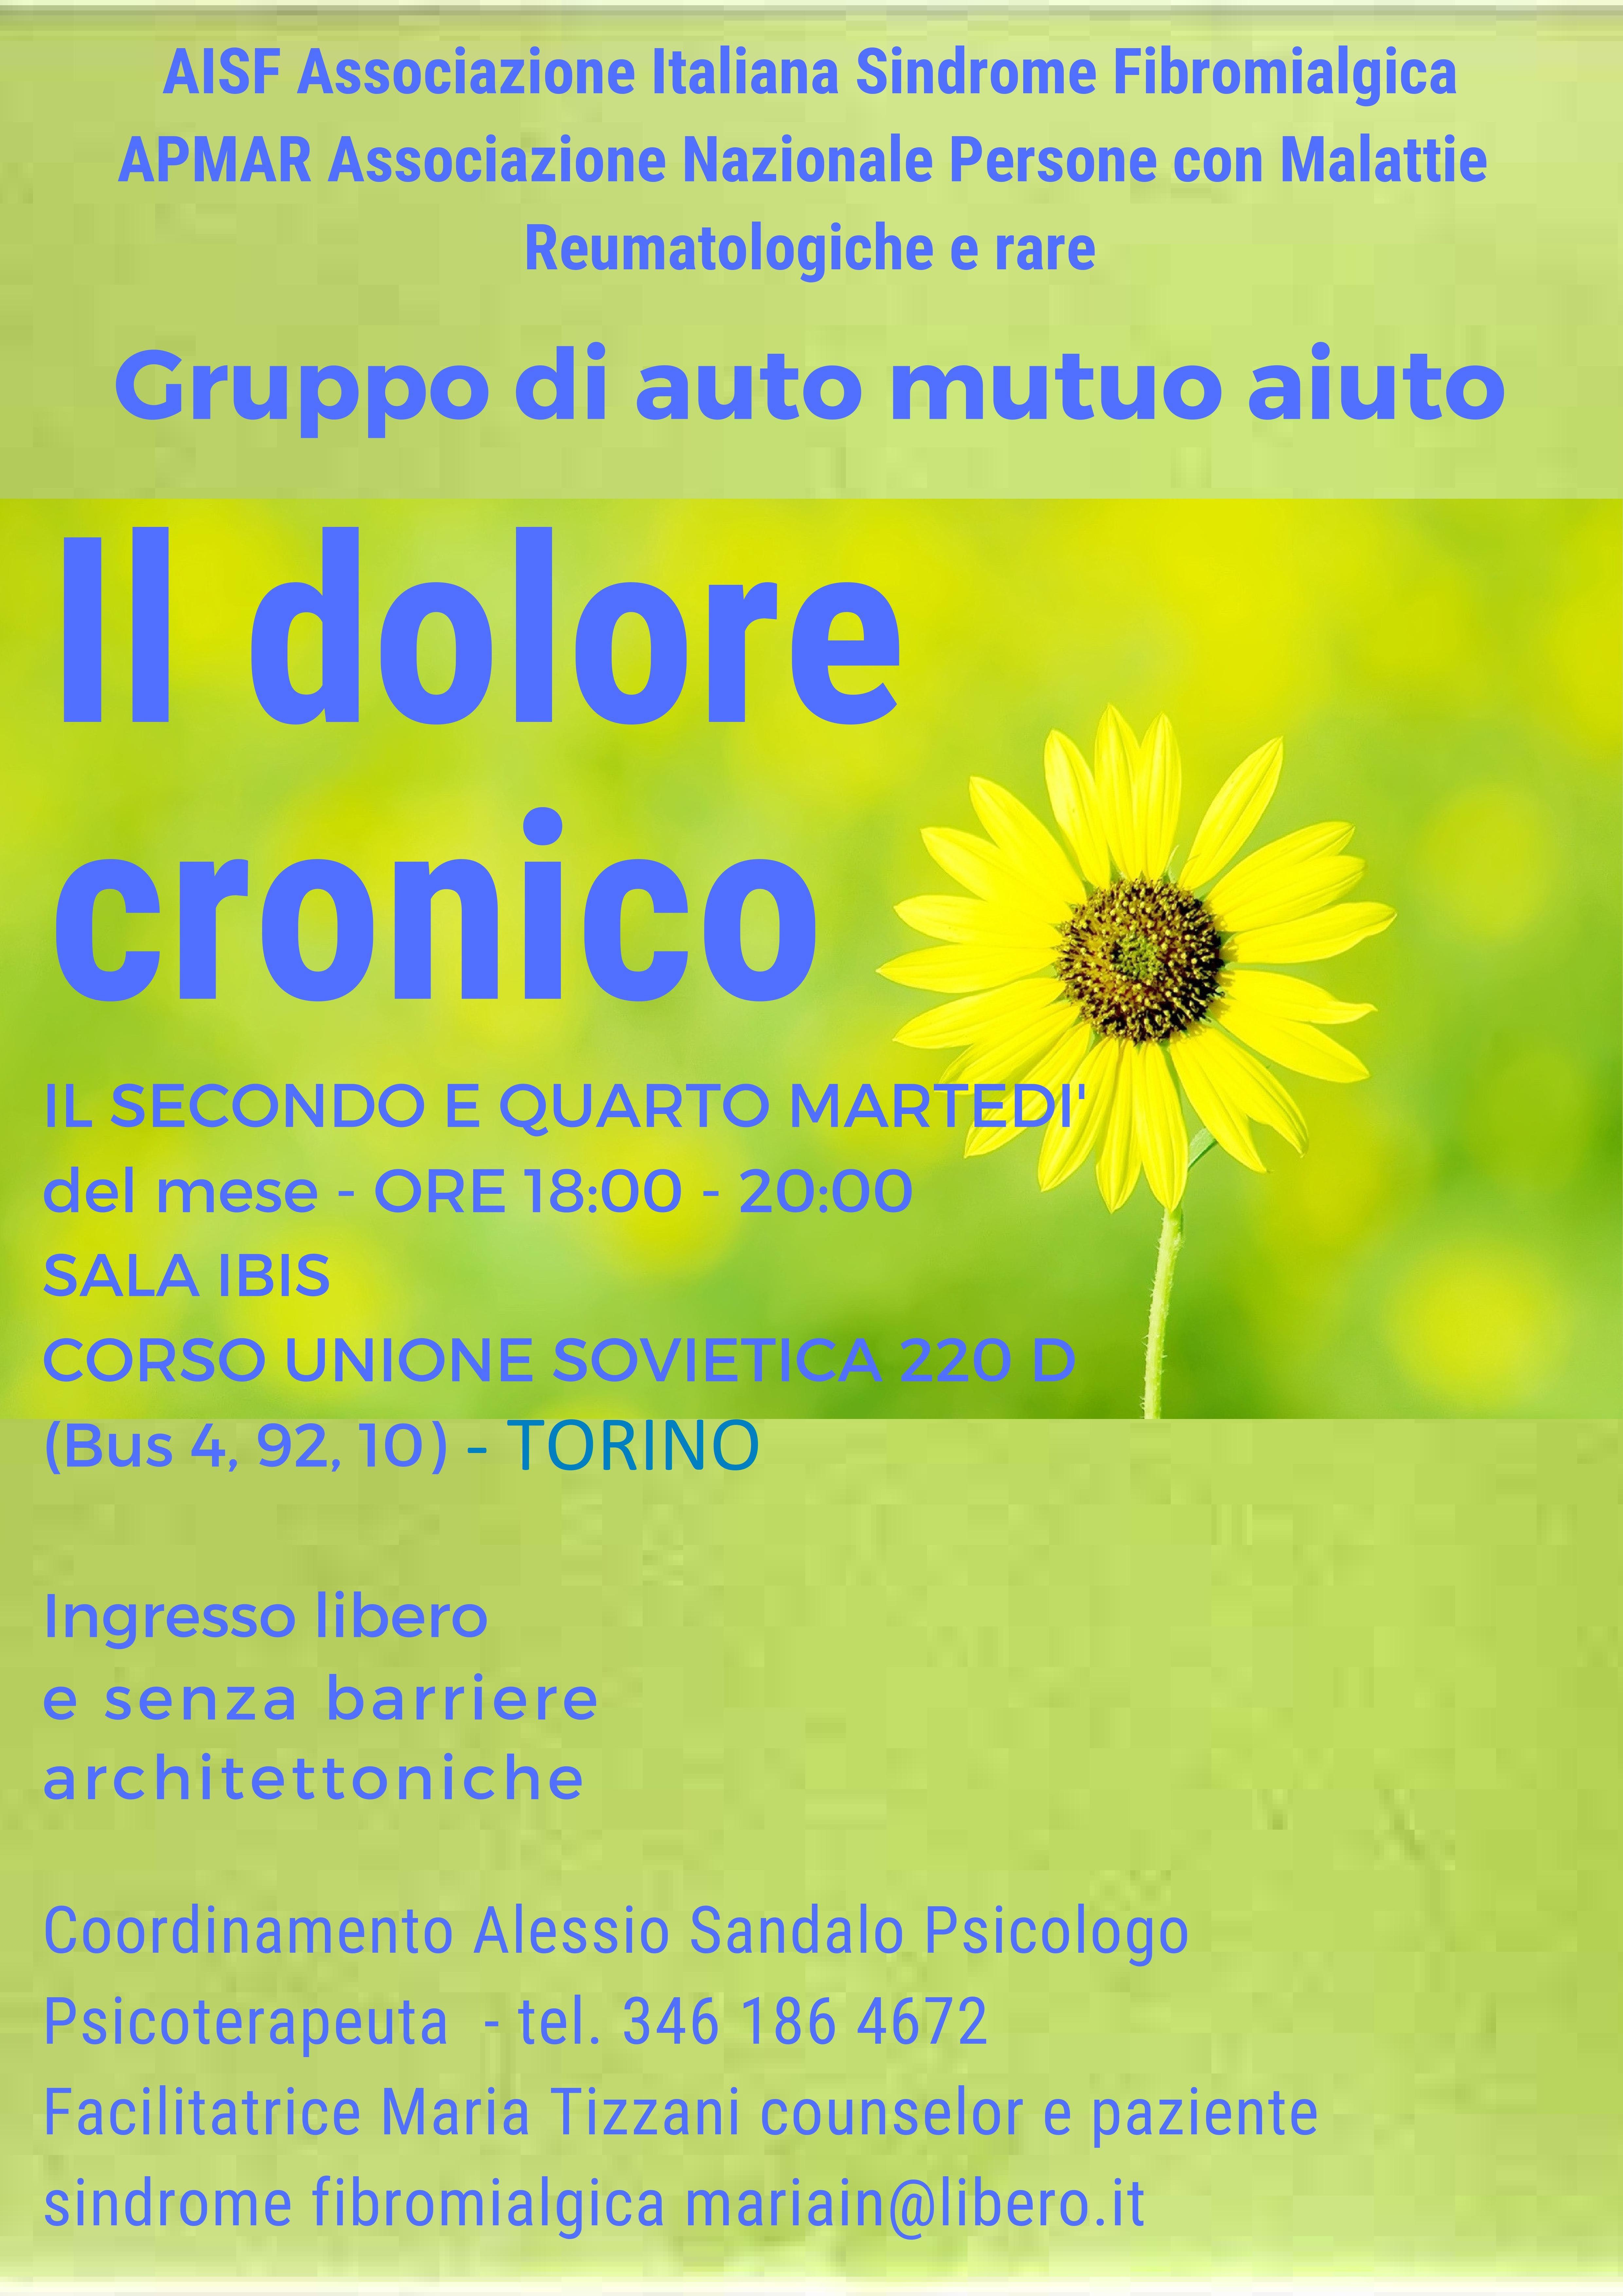 a99d31c606 AISF | Associazione Italiana Sindrome Fibromialgica